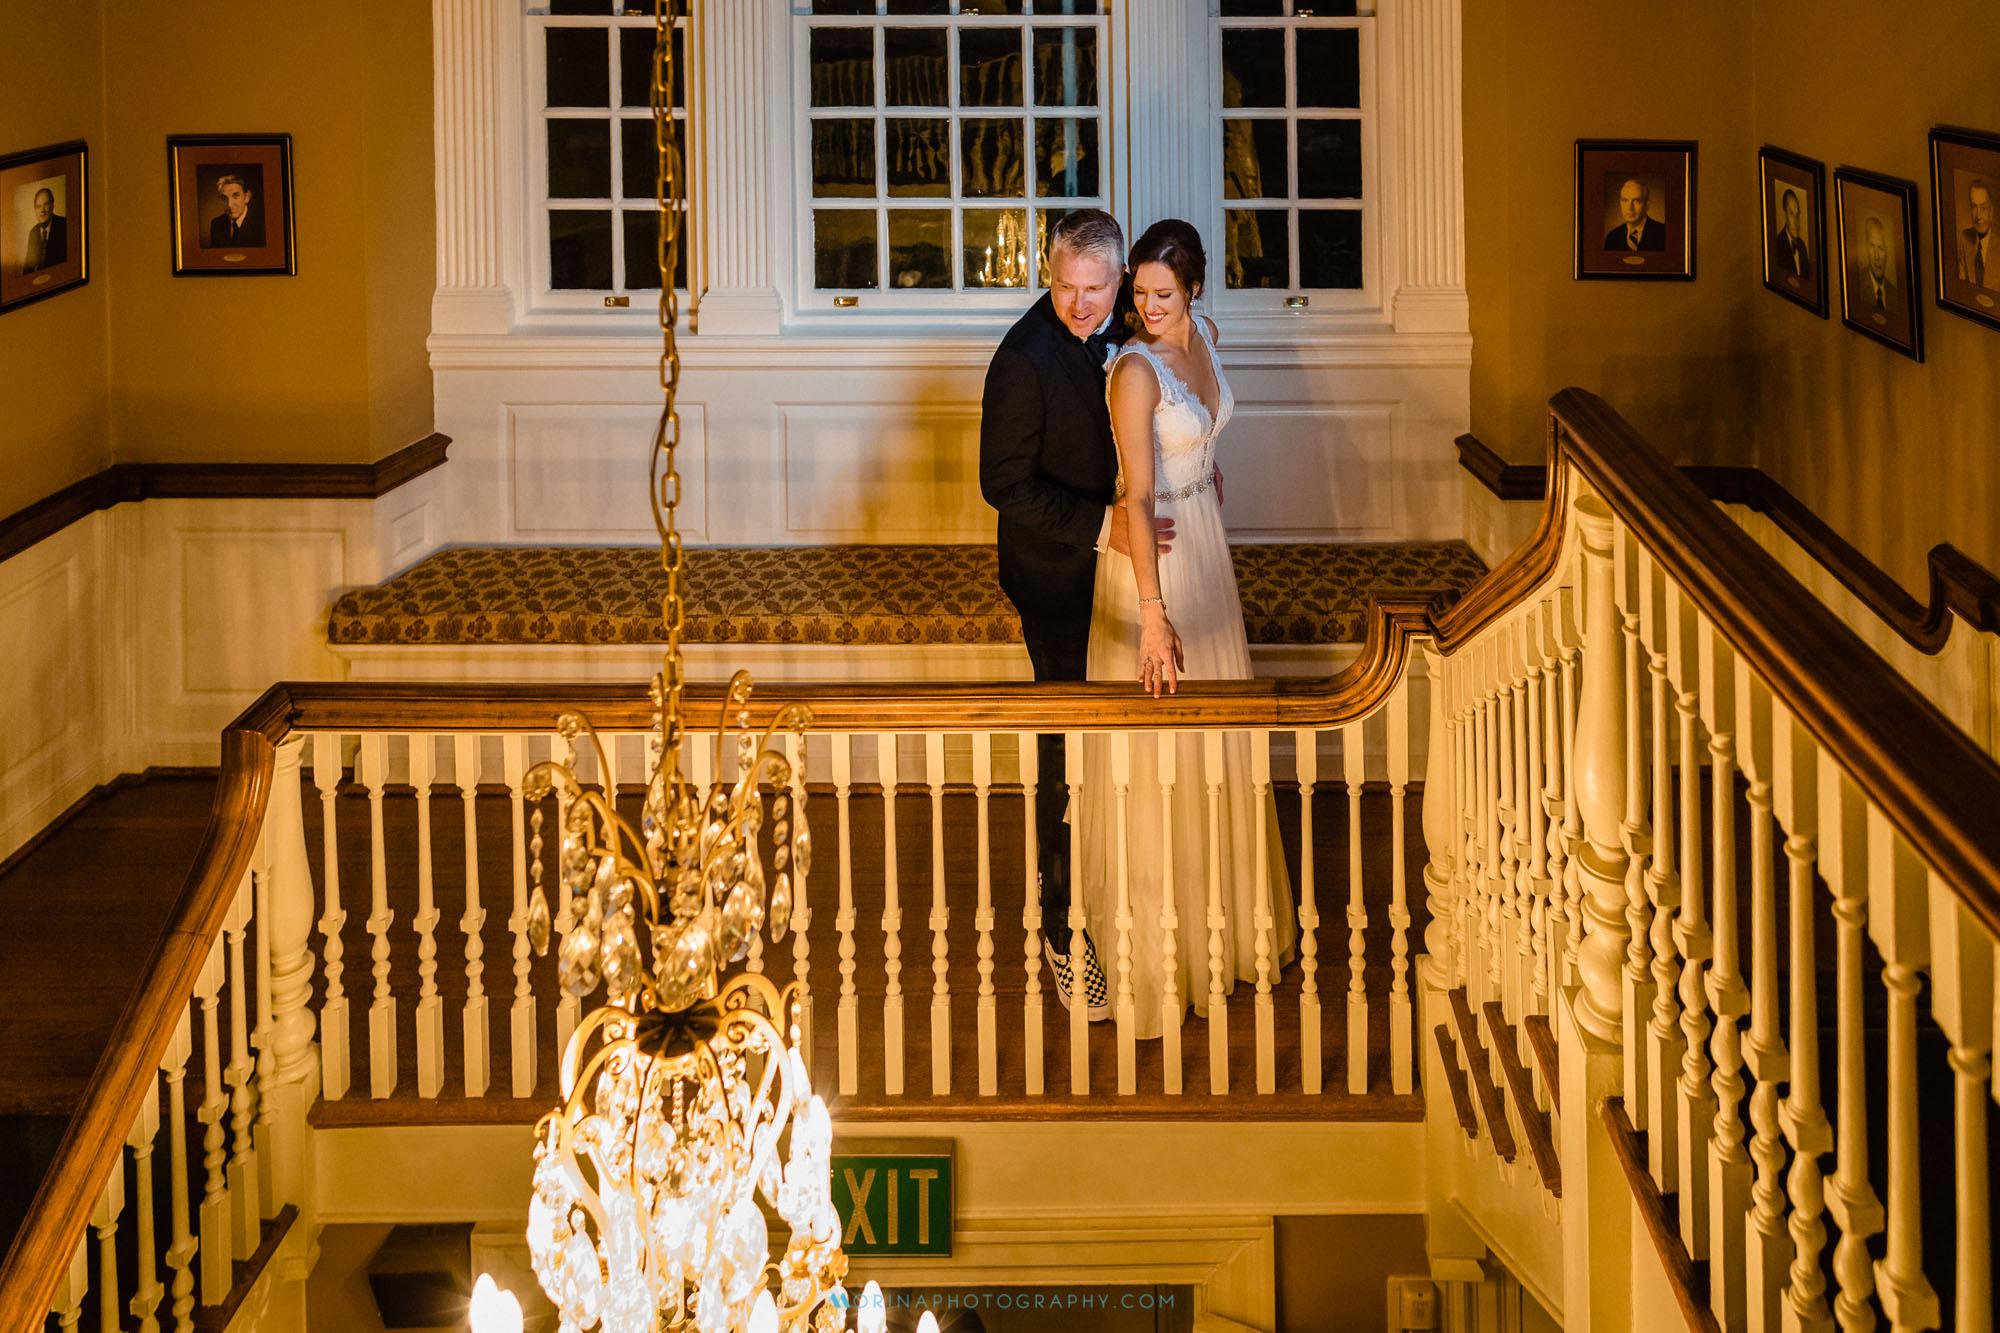 Colleen & Bill Wedding at Manufacturers' Golf & Country Club wedding 0076.jpg